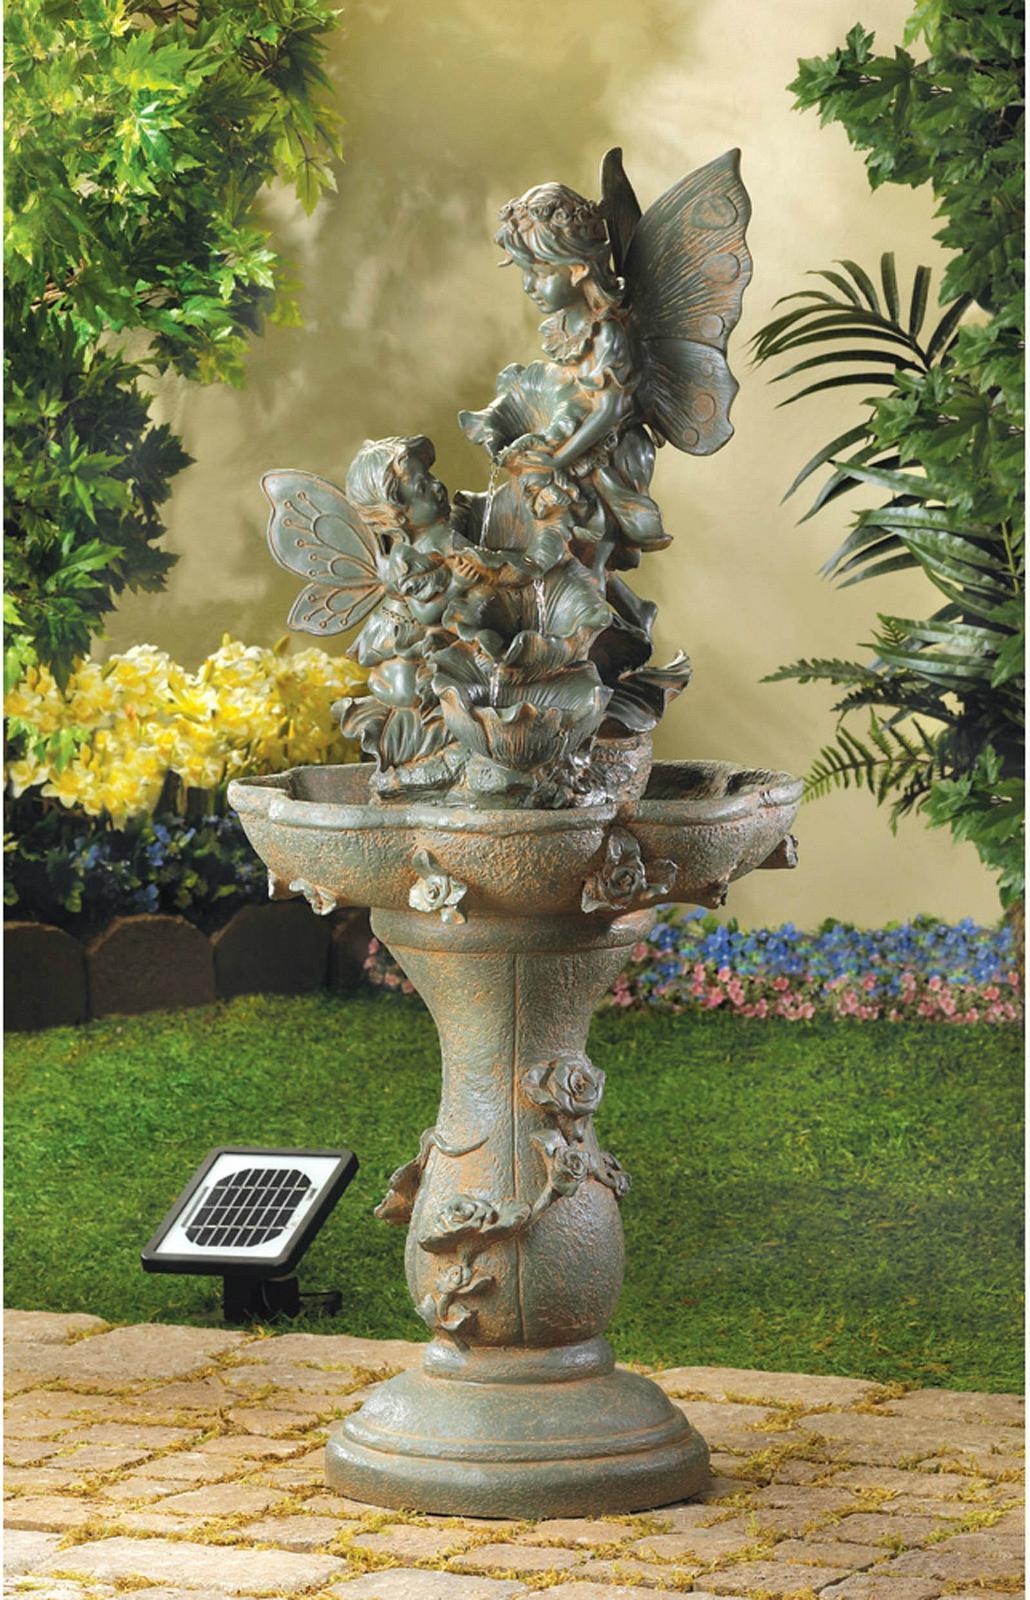 12842u Fairy Figures Stone Look Solar Power Water